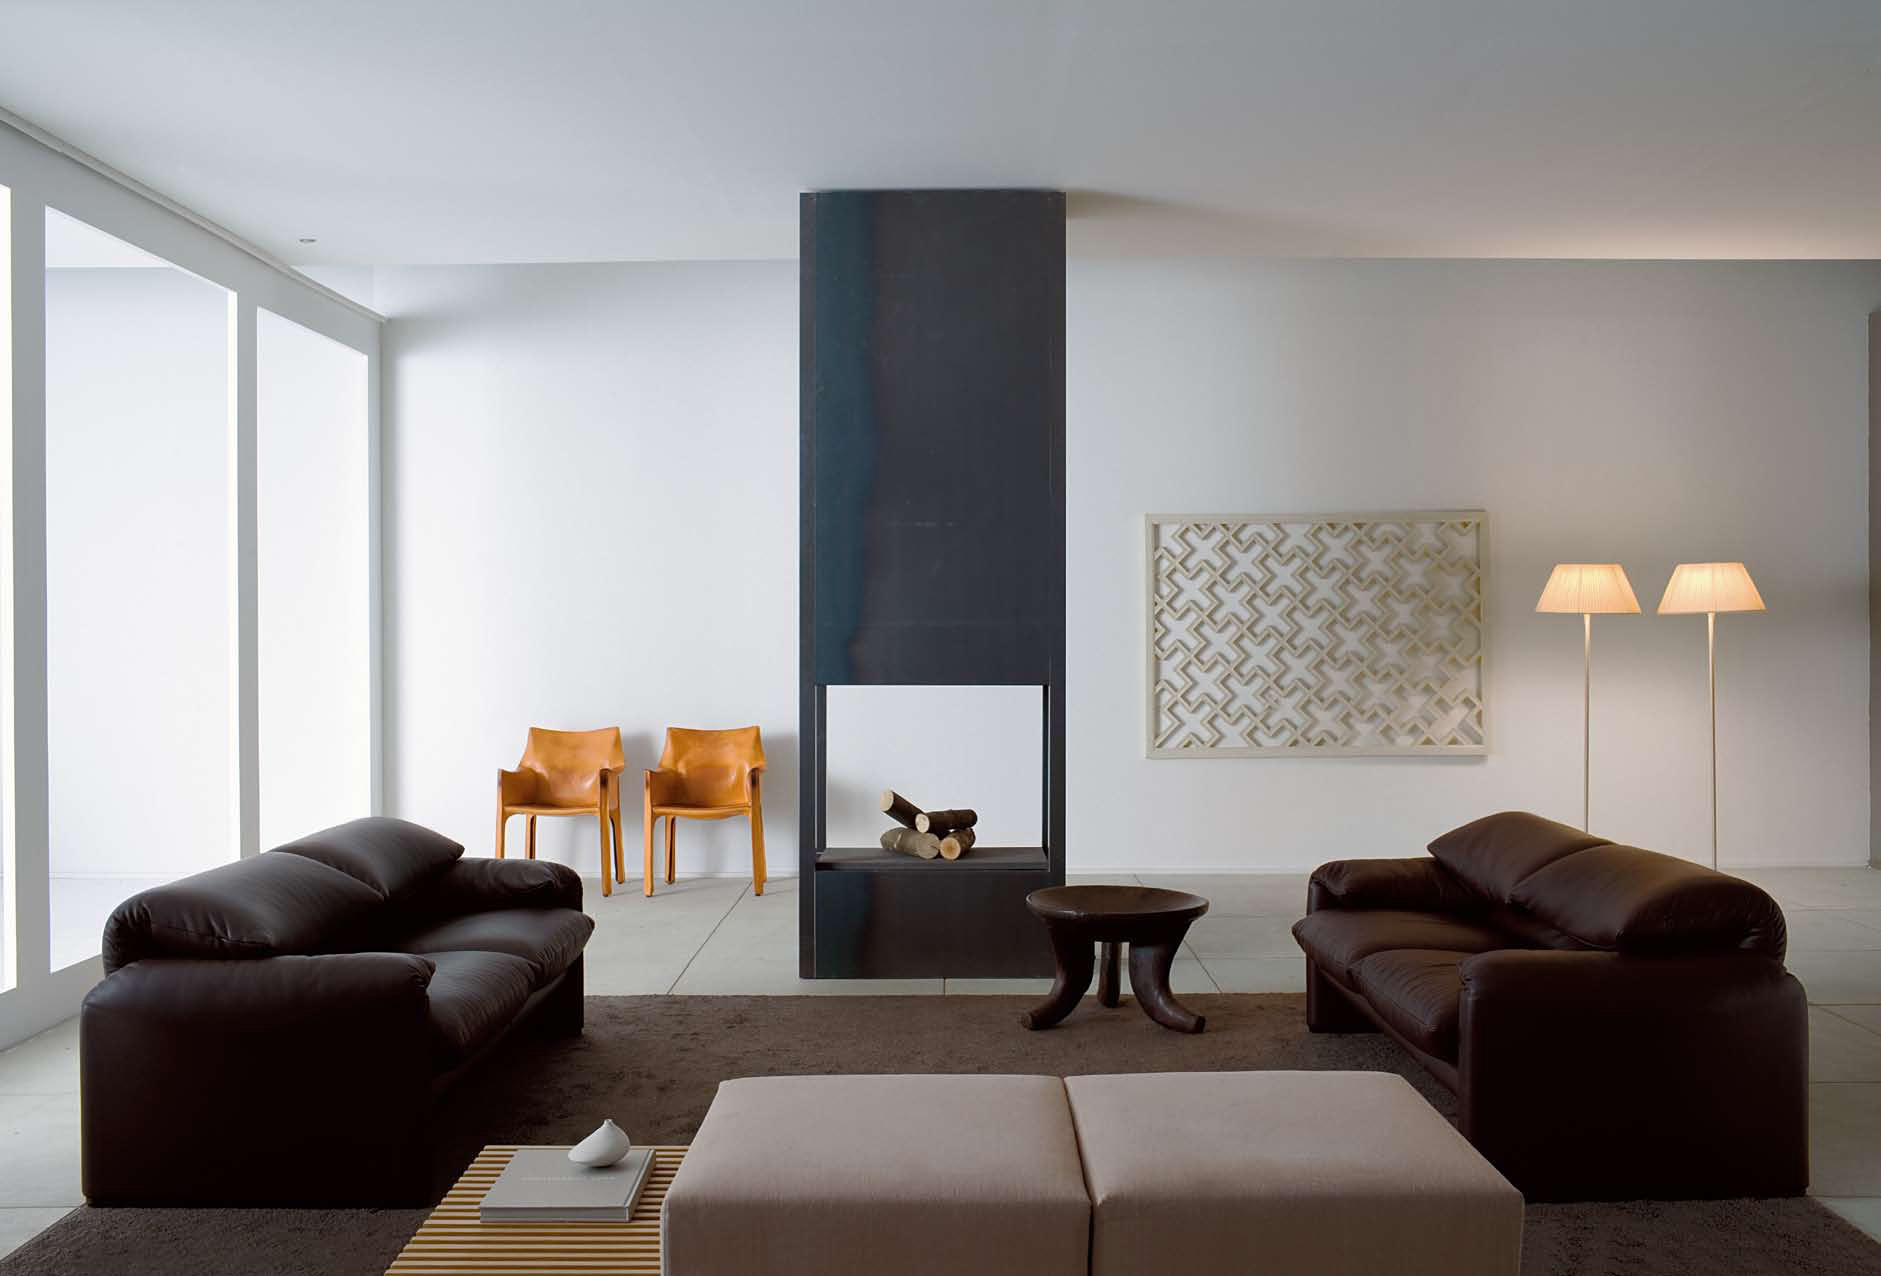 675 maralunga 40 canap s d 39 attente de cassina architonic. Black Bedroom Furniture Sets. Home Design Ideas